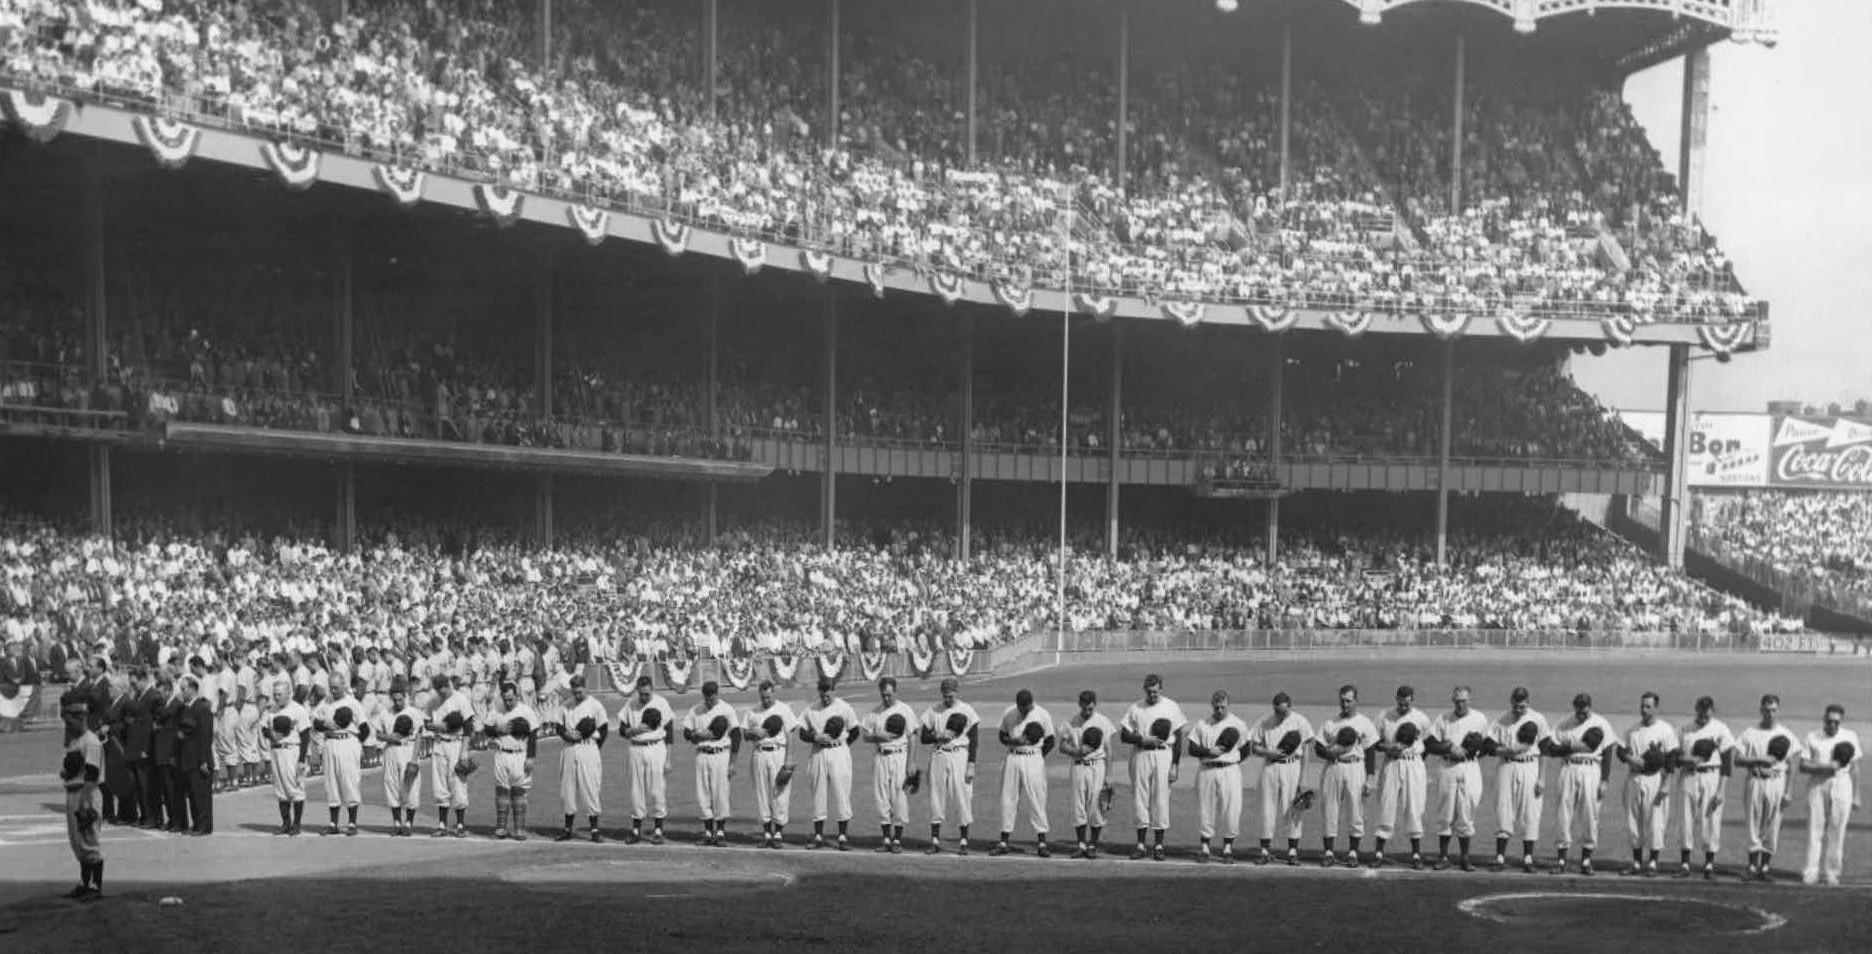 ankee Stadium, 1955 World Series